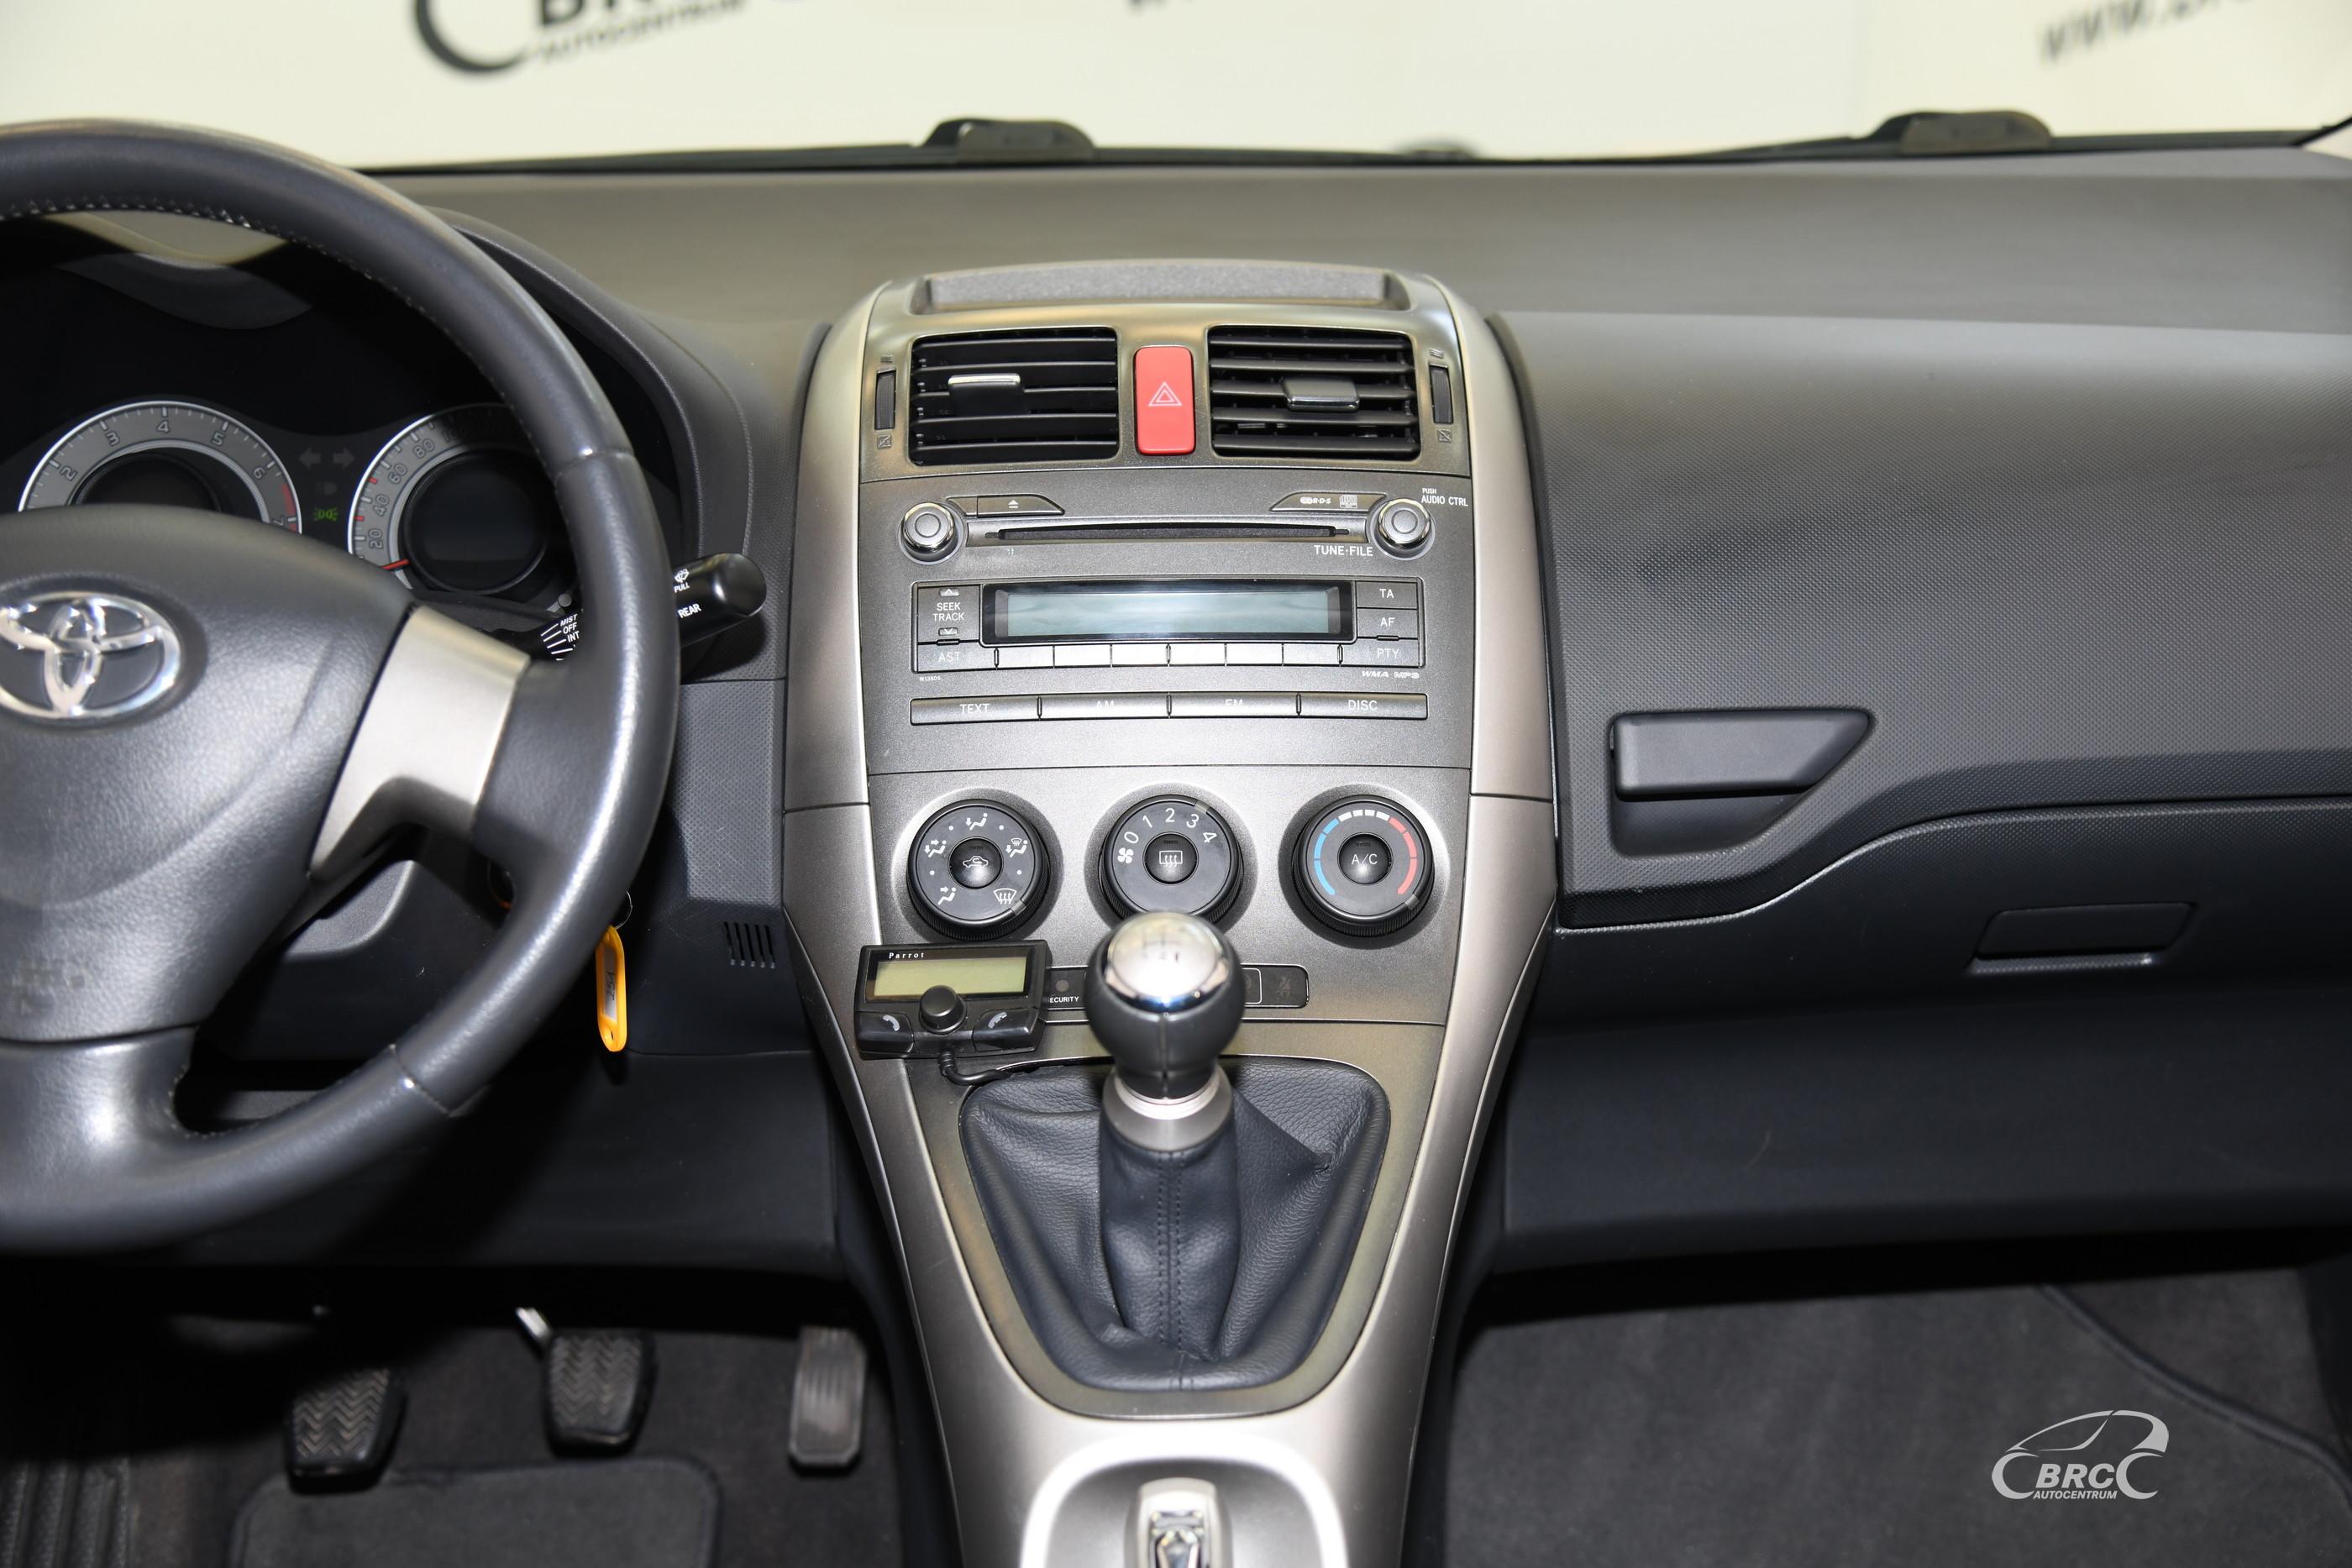 Toyota Auris 1.6i VVT-i